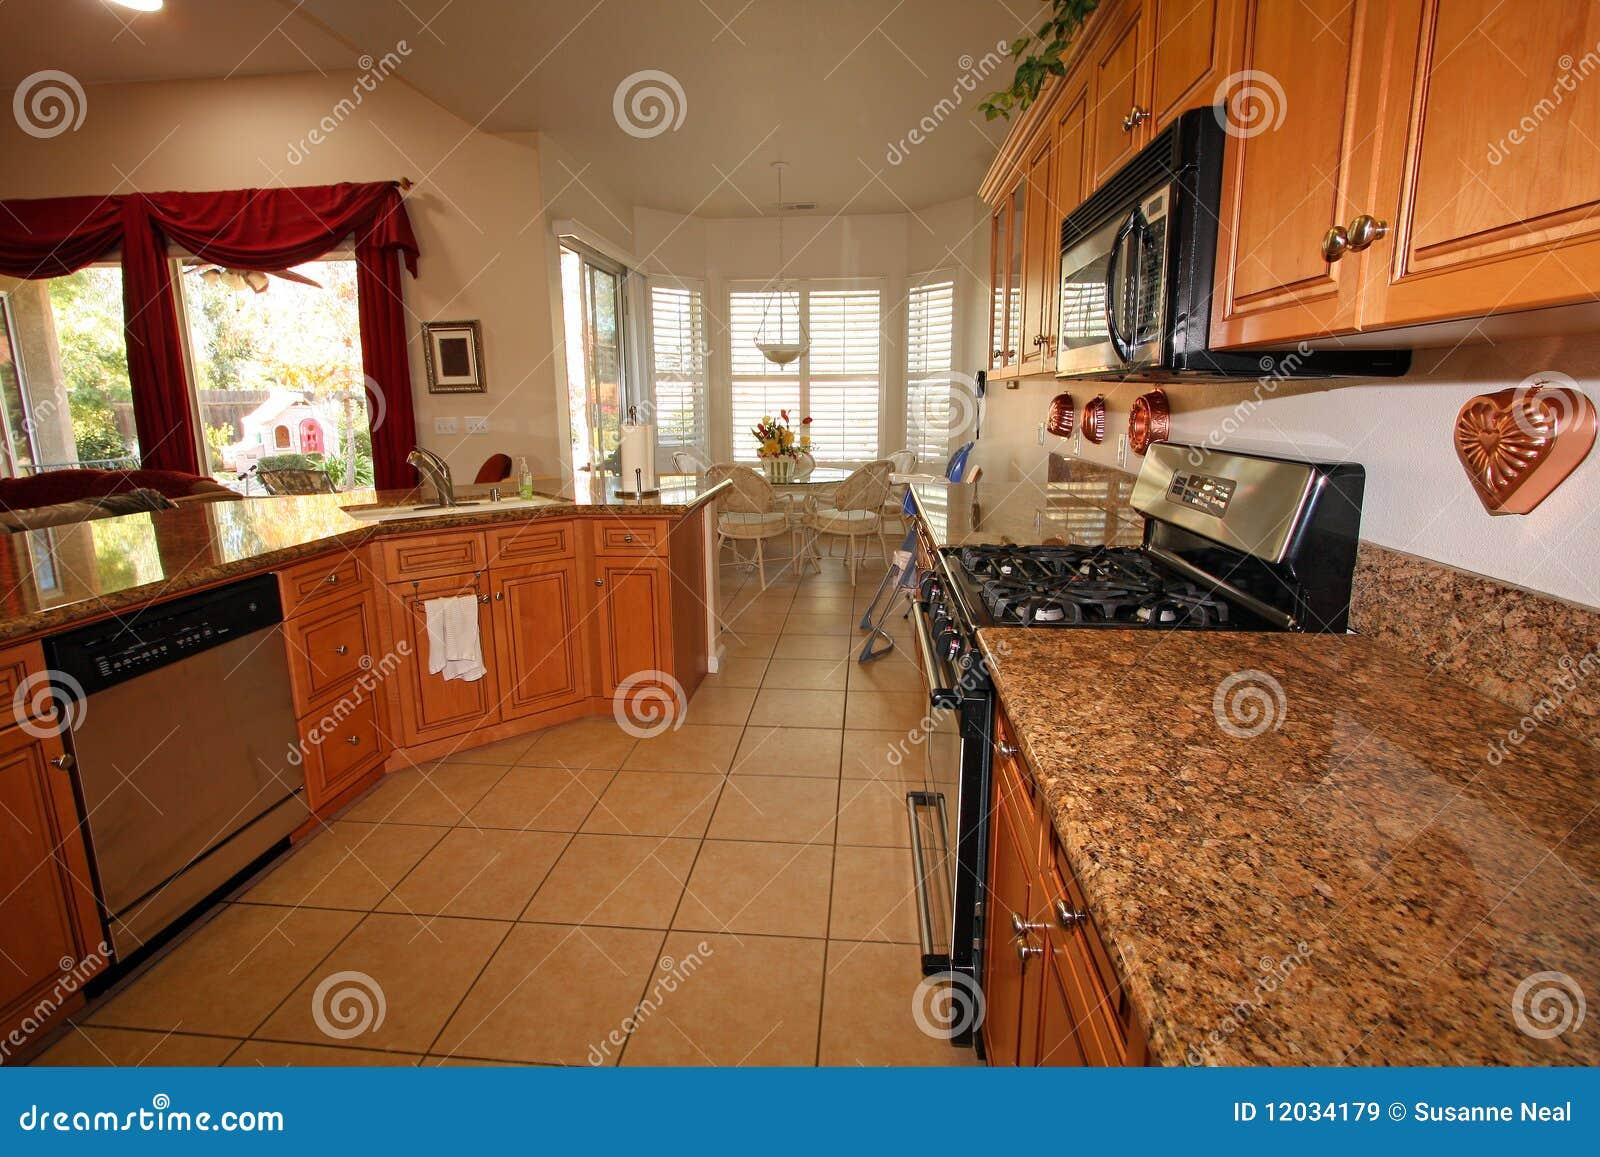 Cucina e sala da pranzo moderne immagini stock libere da - Sala e cucina ...